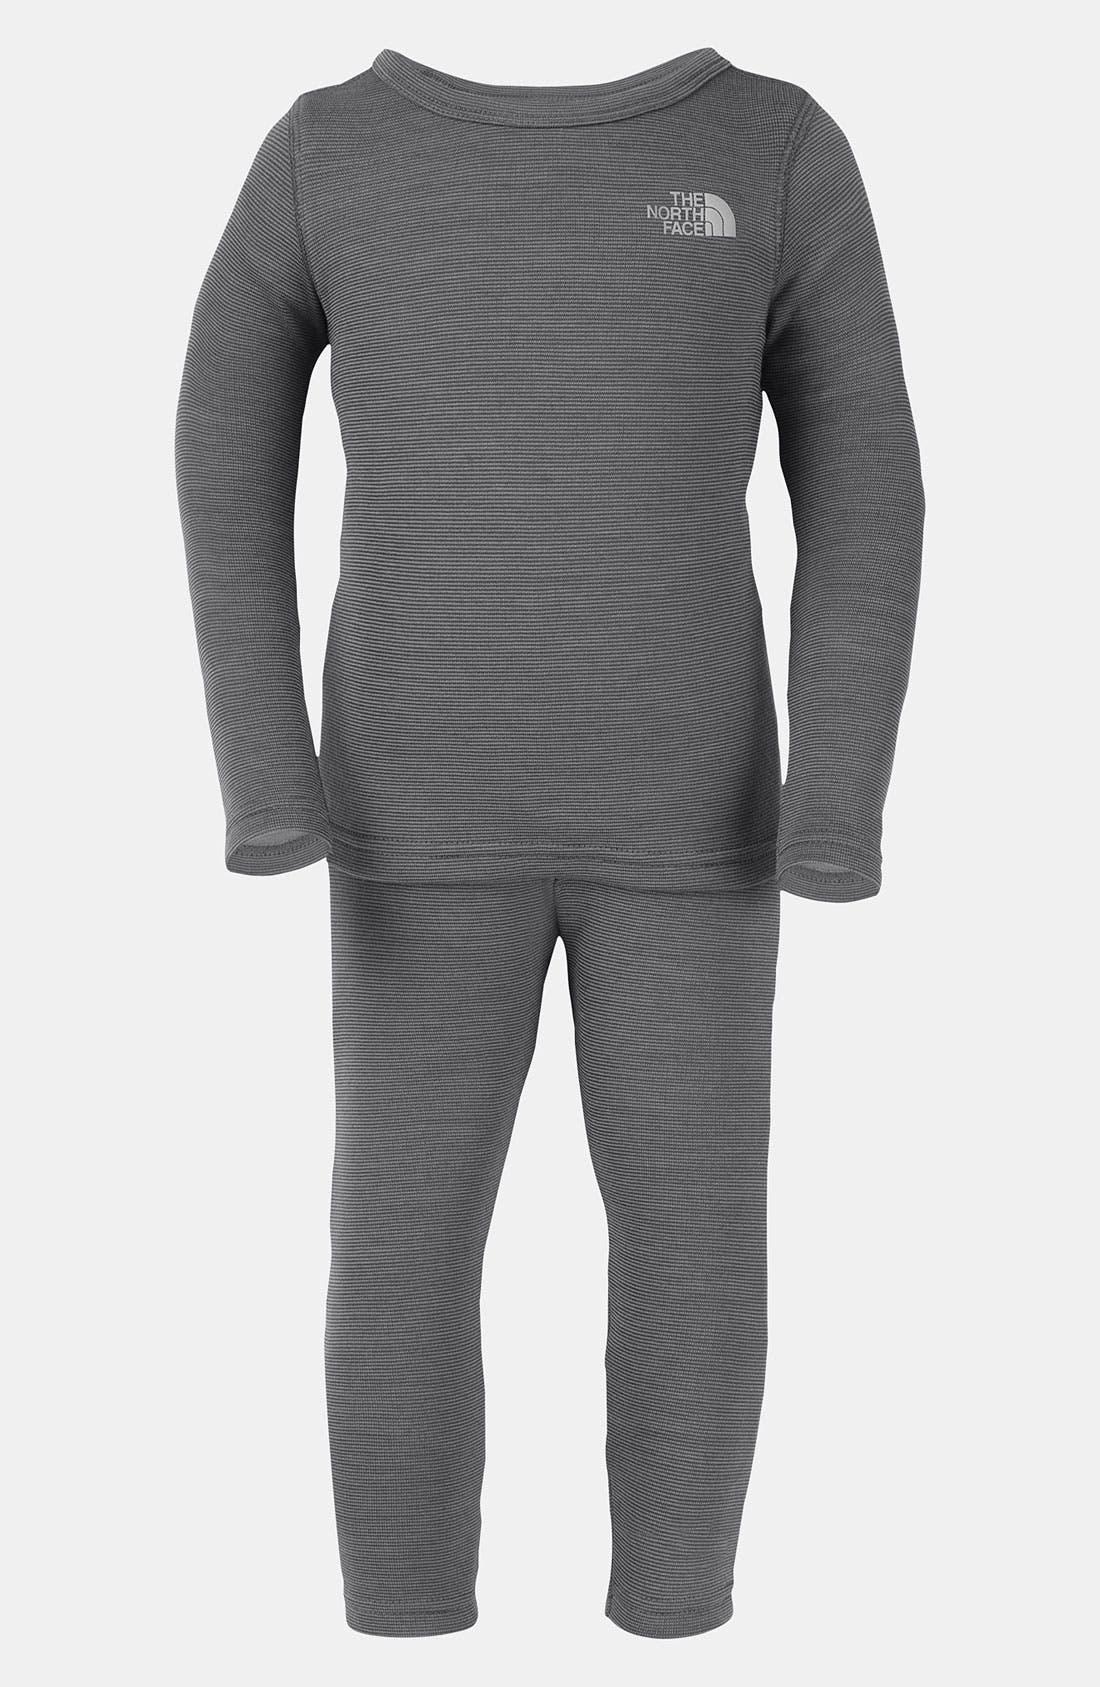 Main Image - The North Face 'Baselayer' Shirt & Leggings (Toddler)